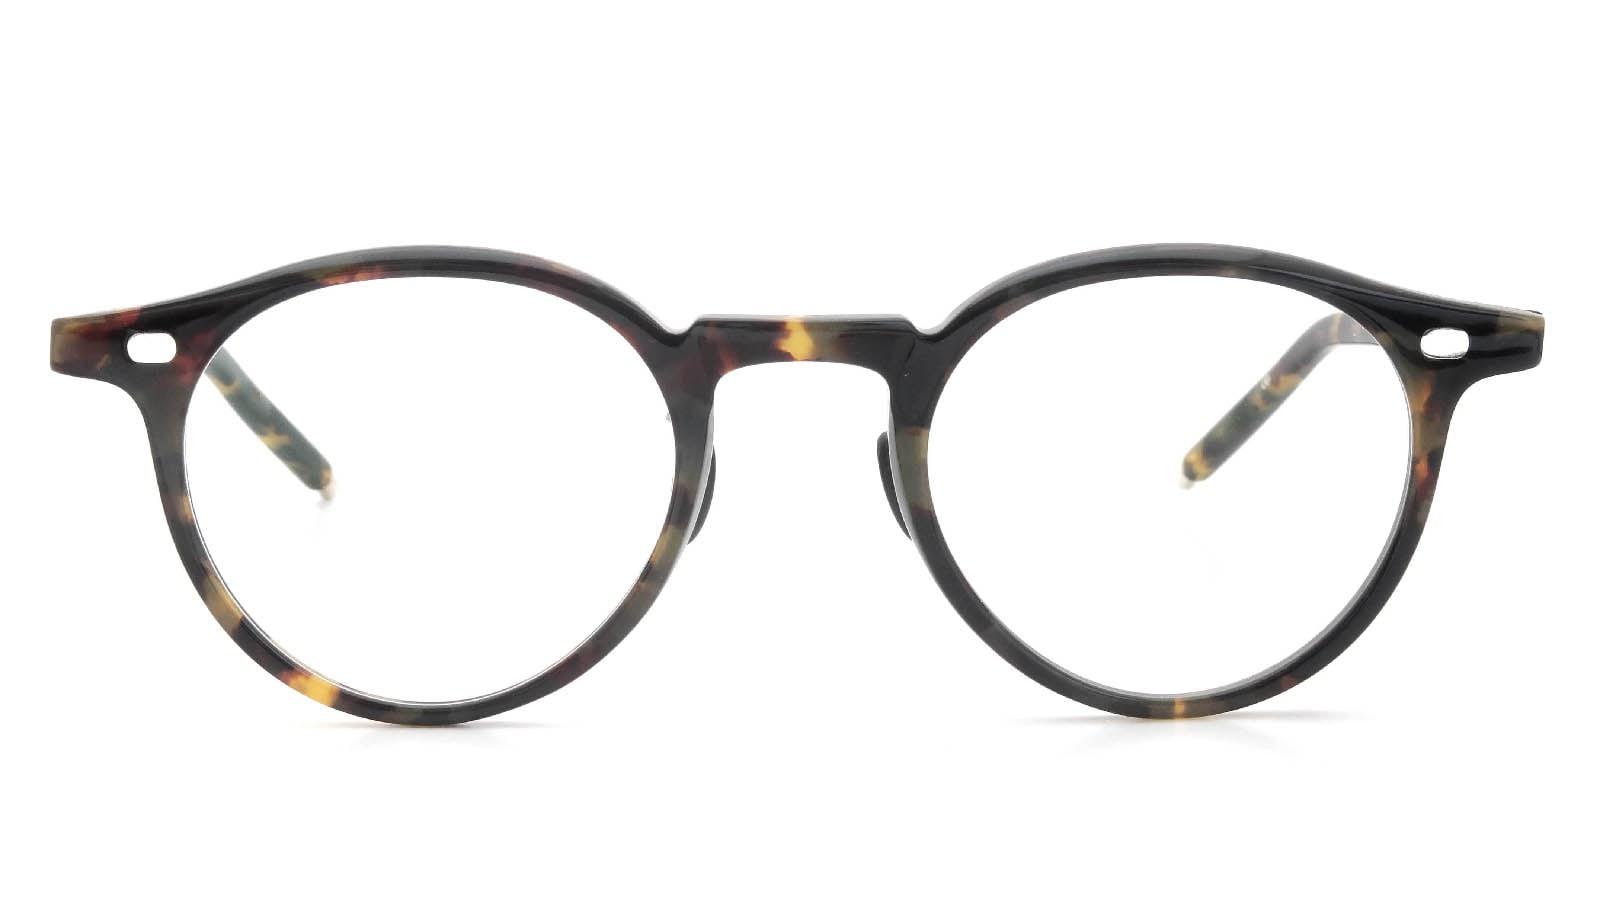 10 eyevan NO.3 Ⅲ 45size 2